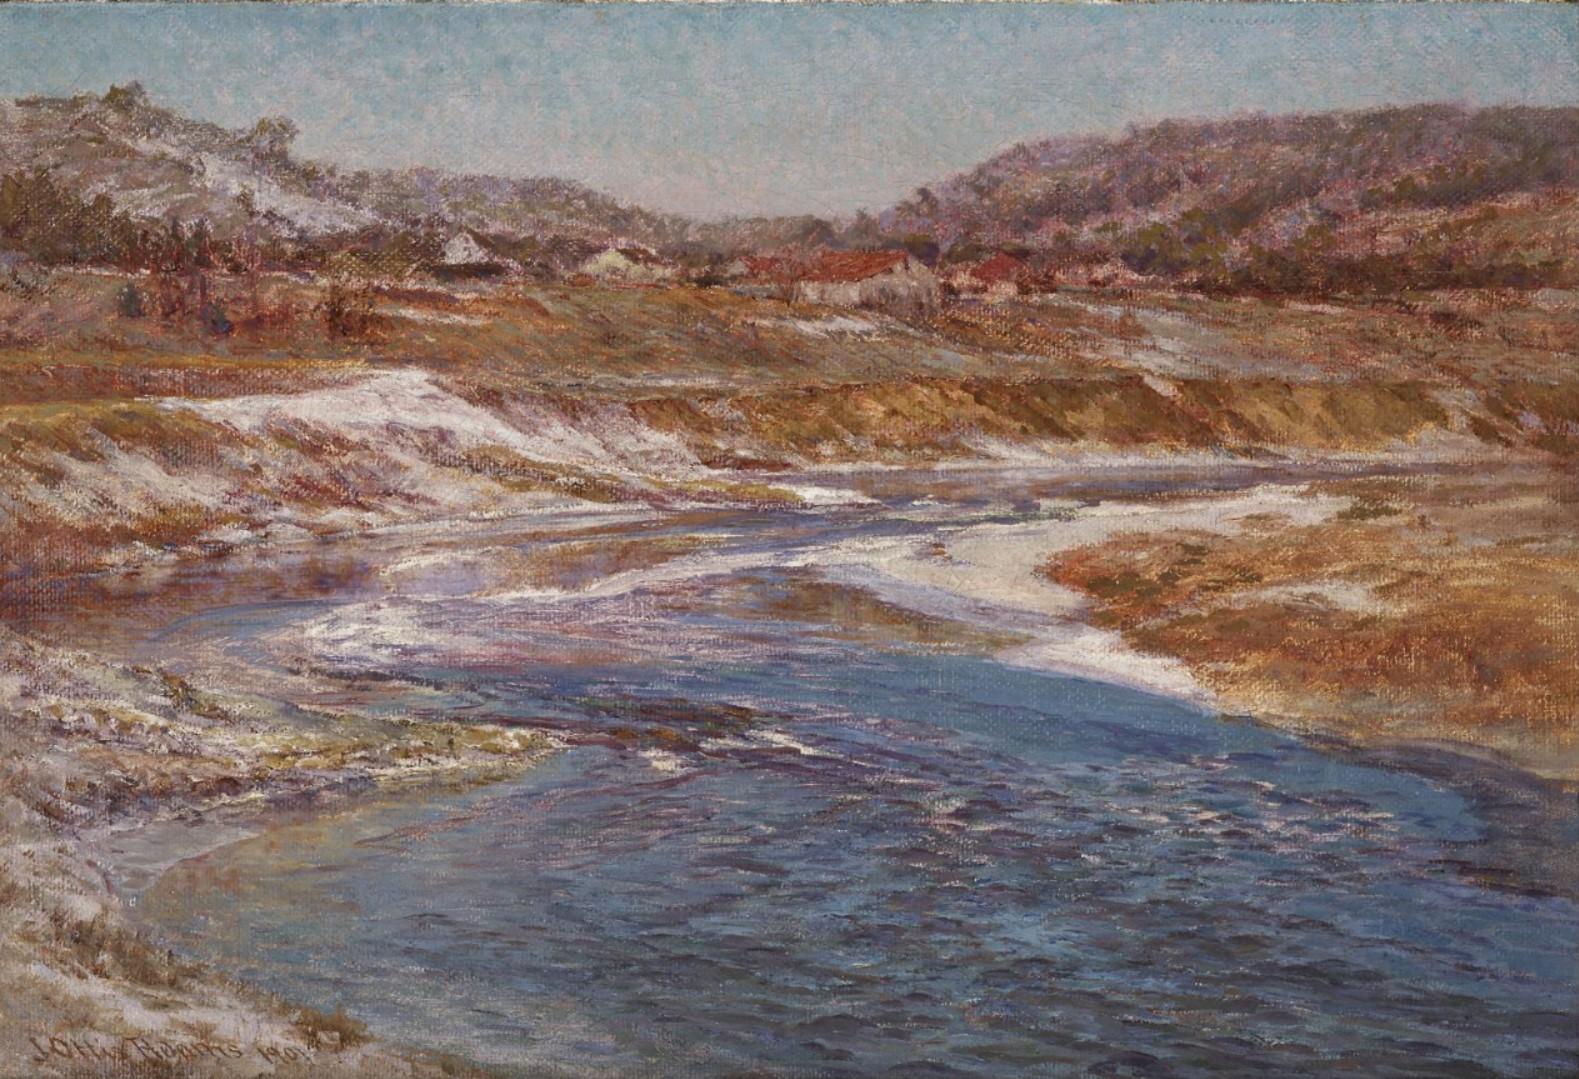 Джон Адамс John Adams картина американский импрессионизм пейзажи природы Альберт Сафиуллин